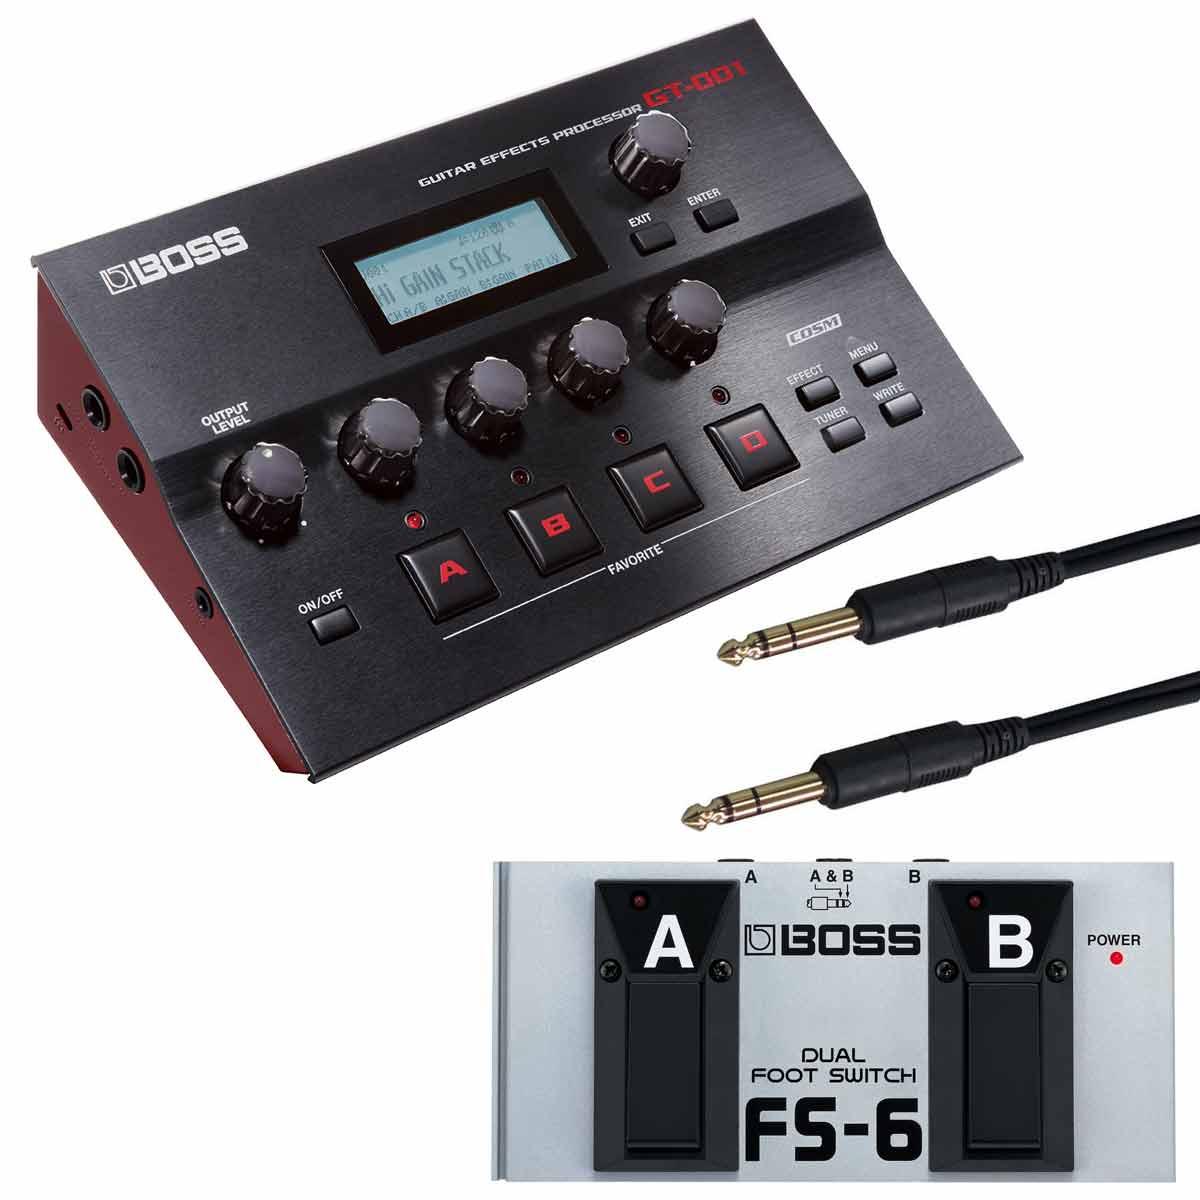 BOSS / GT-001 Guitar Effects Processor 【FS-6純正オプションフットスイッチセット】ボス マルチエフェクター【YRK】